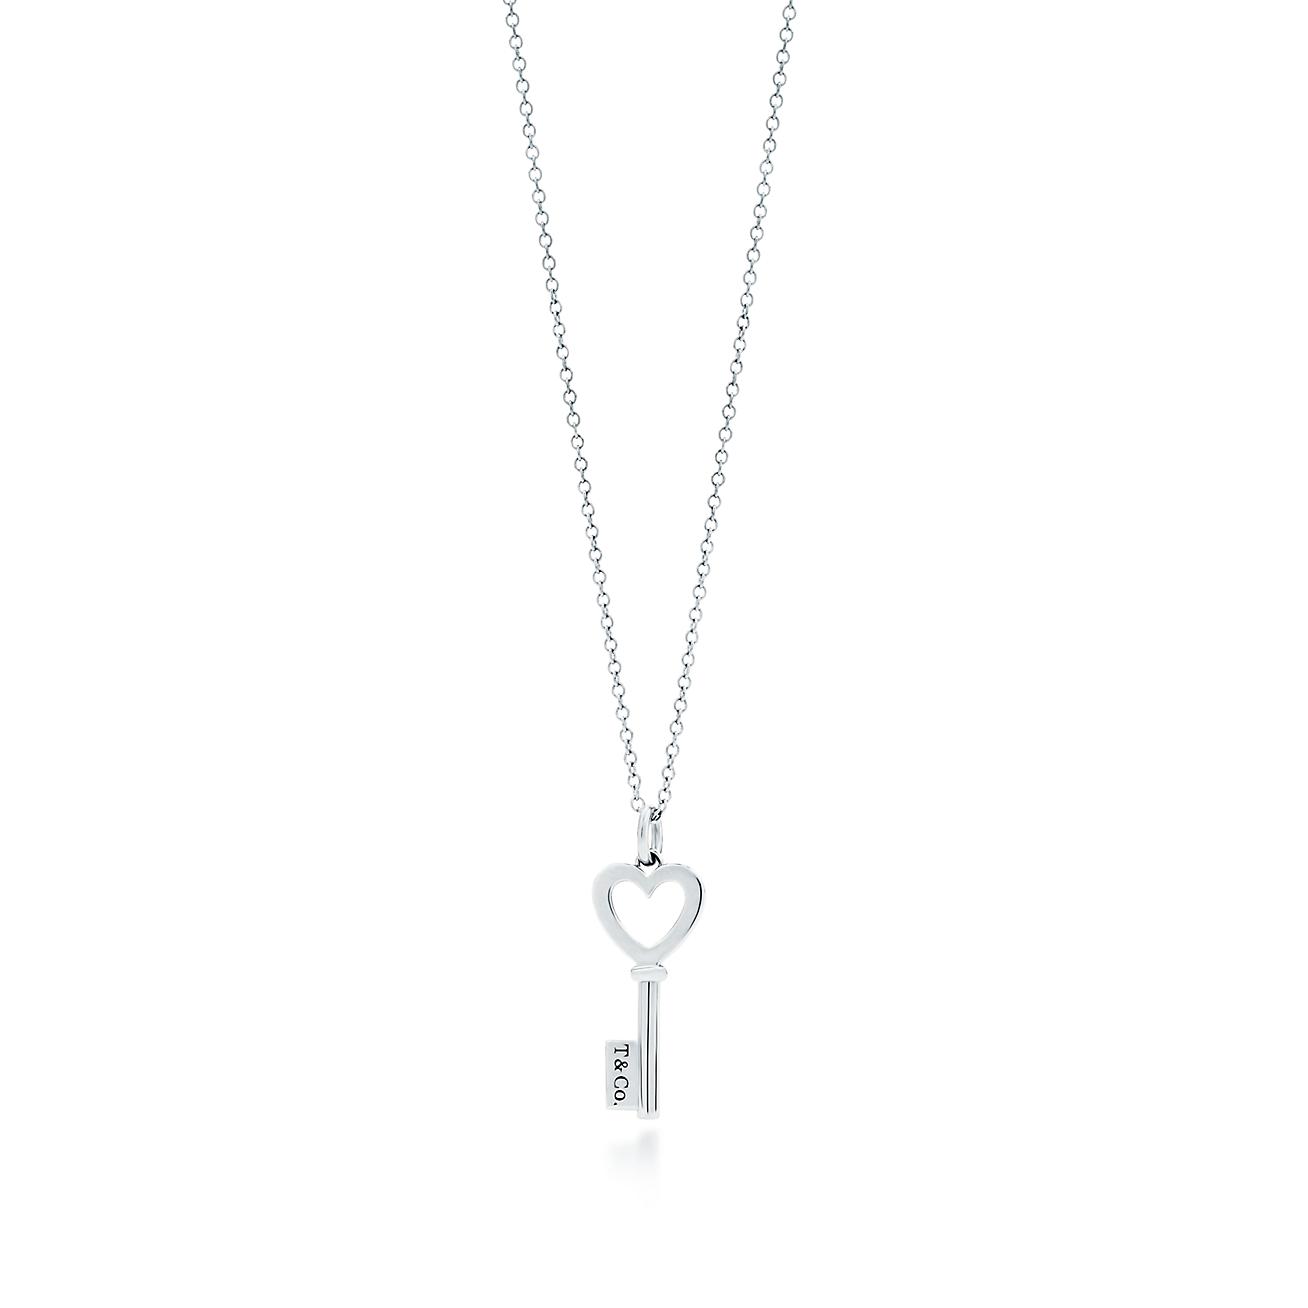 Tiffany keys heart key pendant in sterling silver mini tiffany co deletelarge tiffany keysheart key pendant aloadofball Choice Image